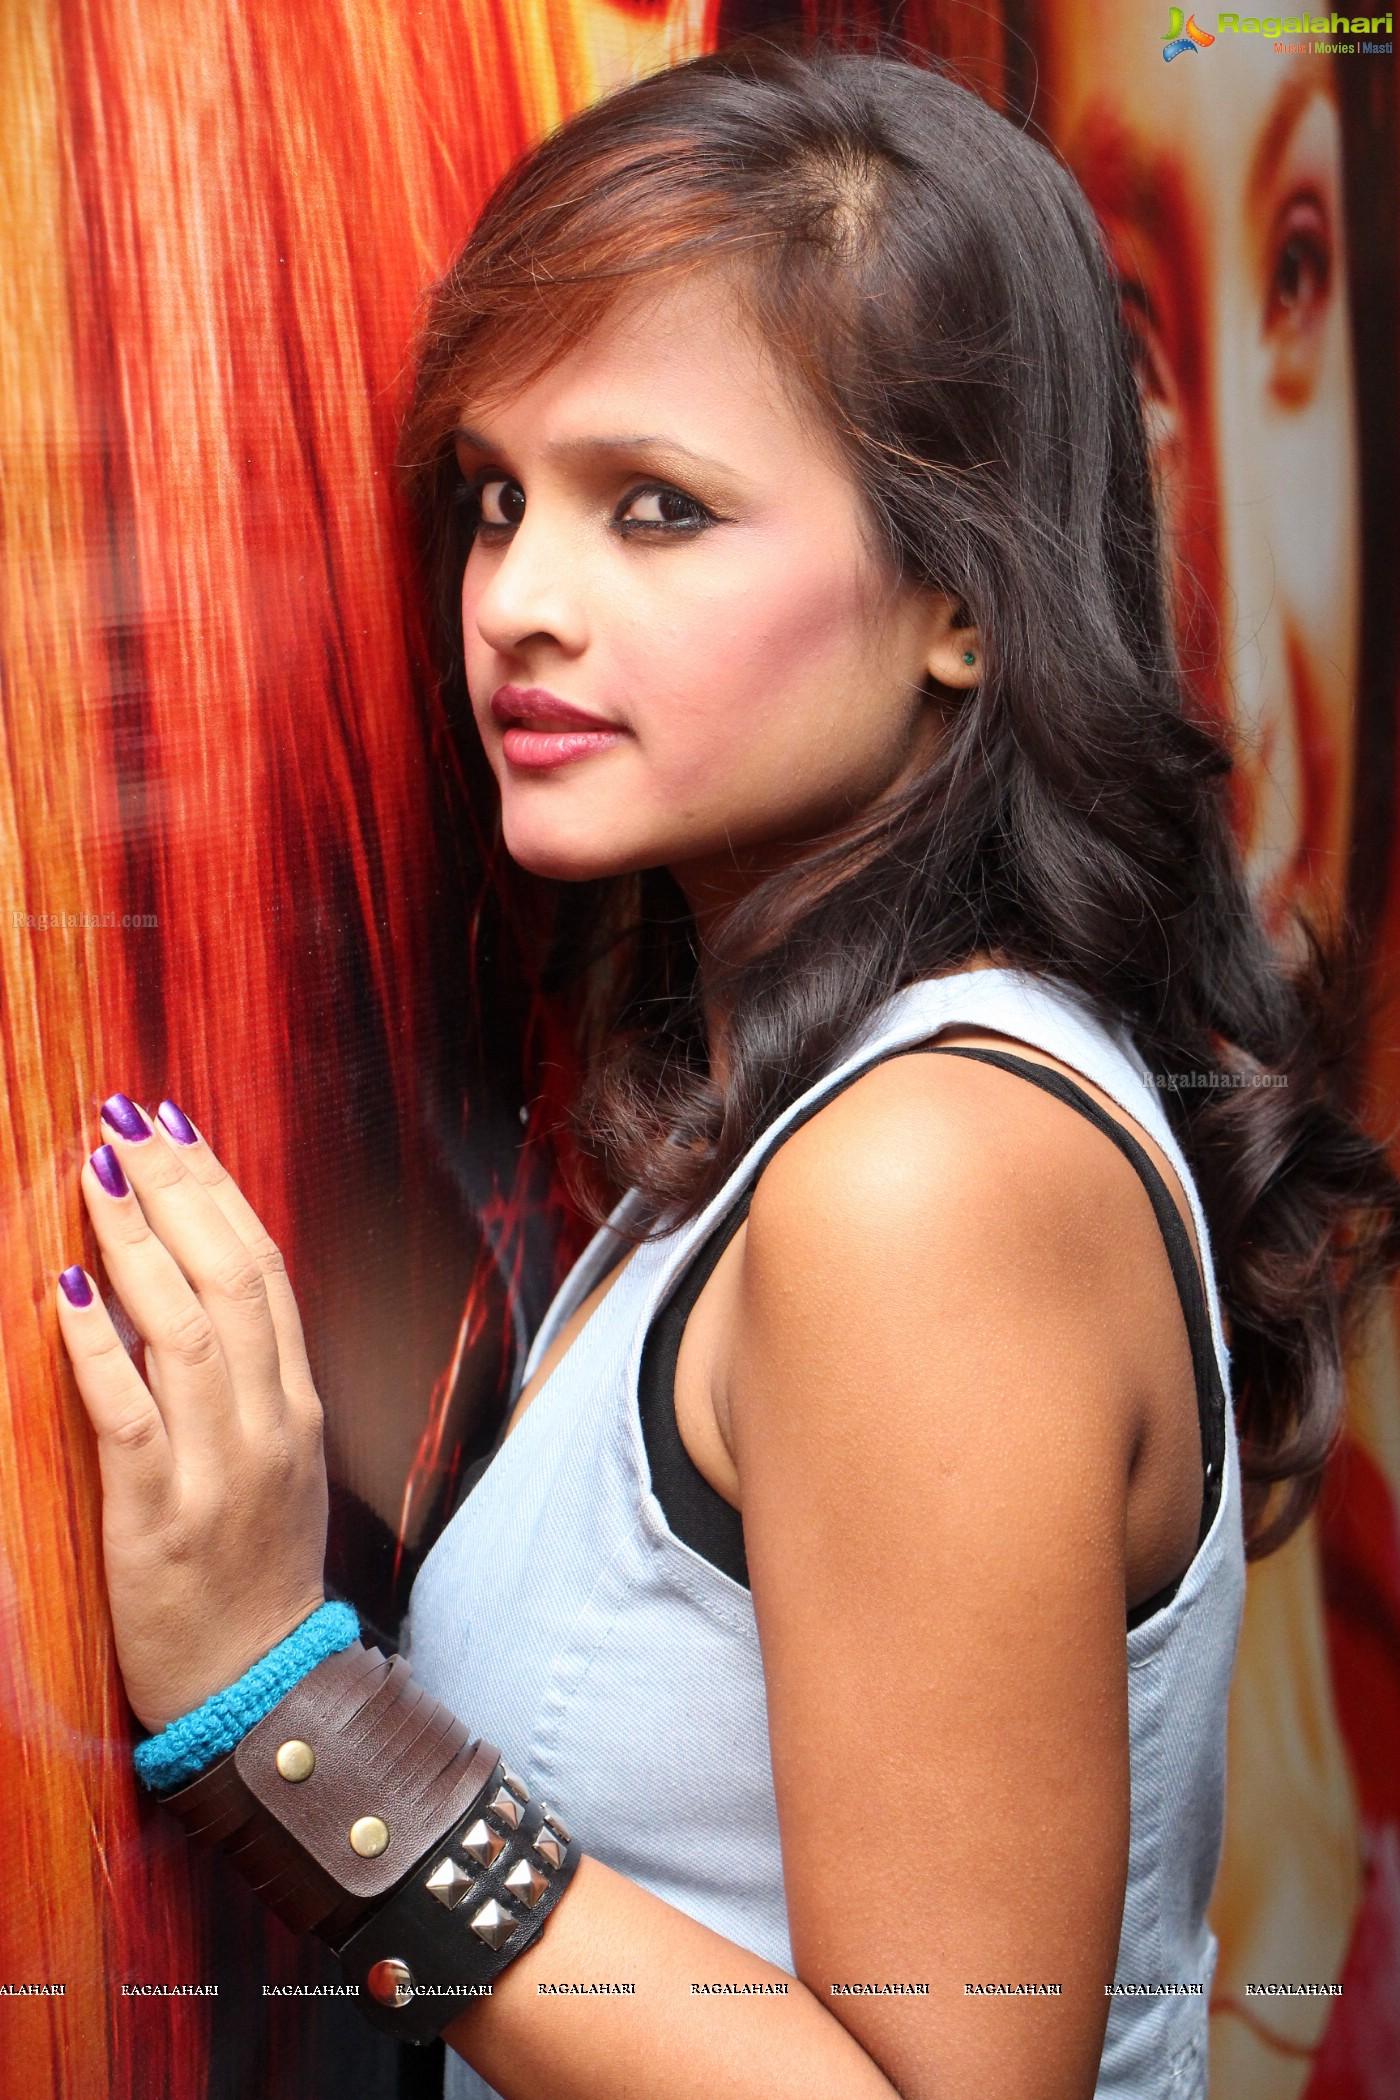 Saritha (Posters)